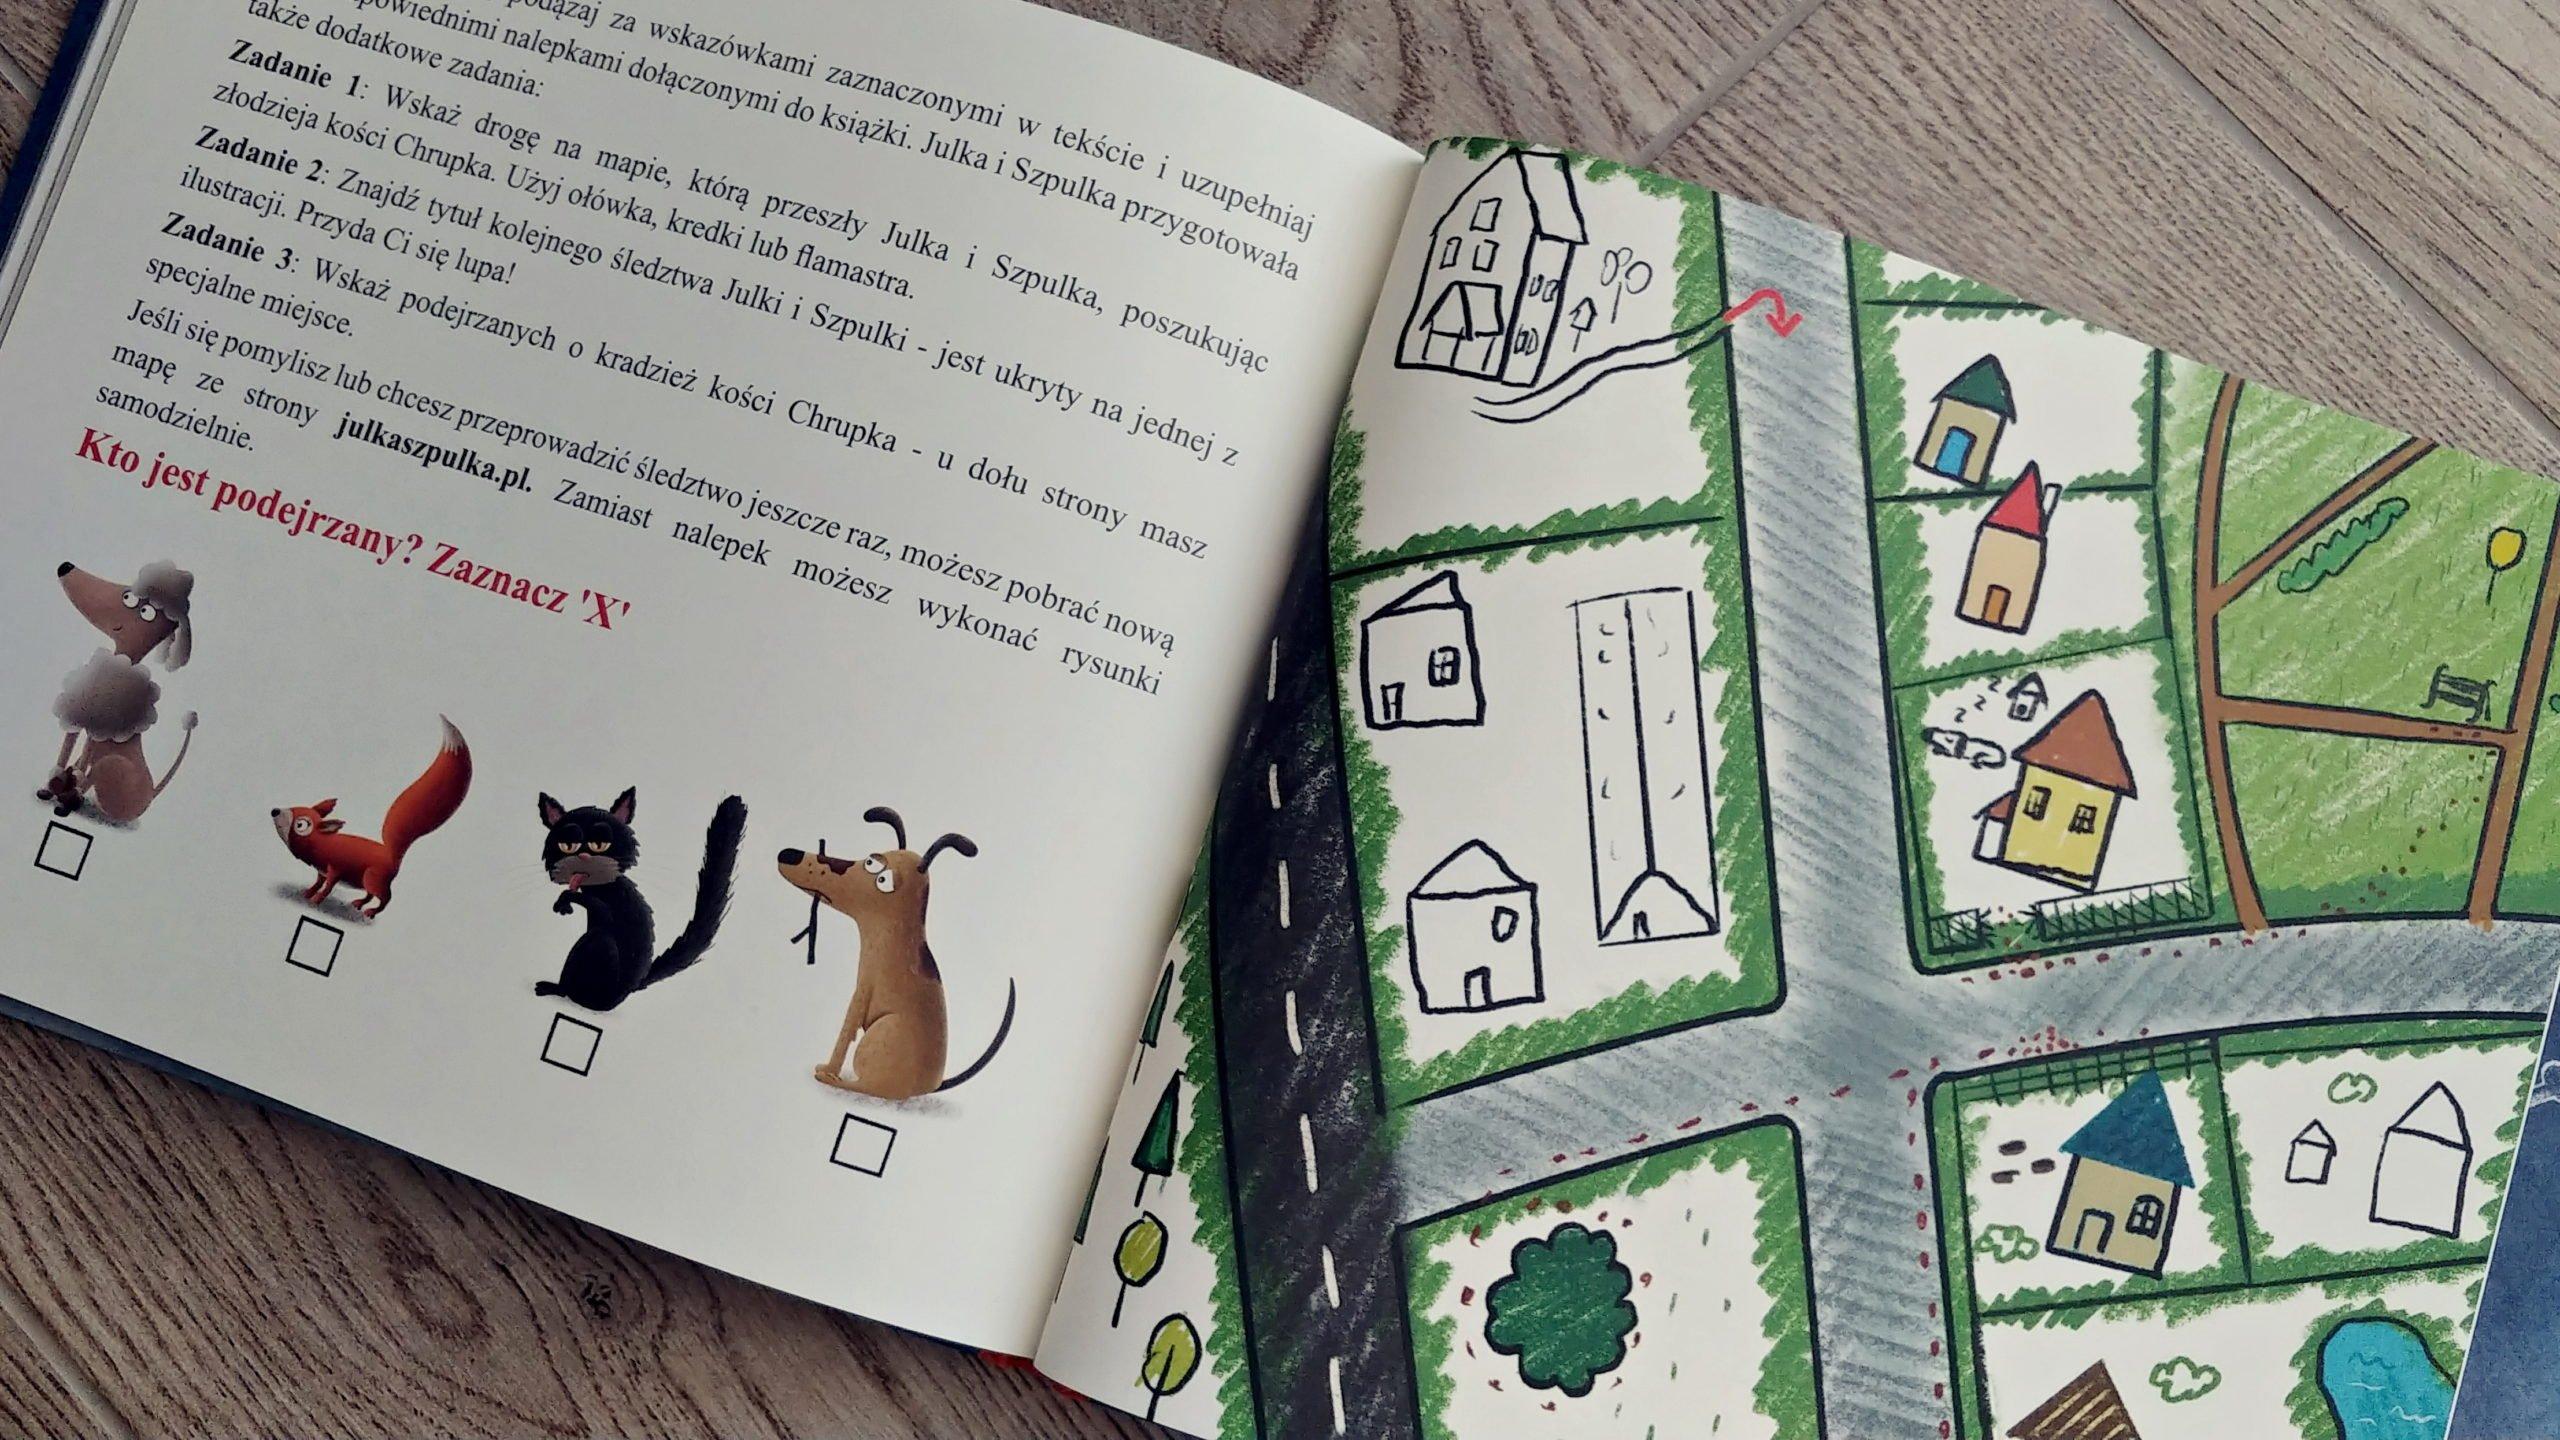 Julka i szpulka opinie o książce